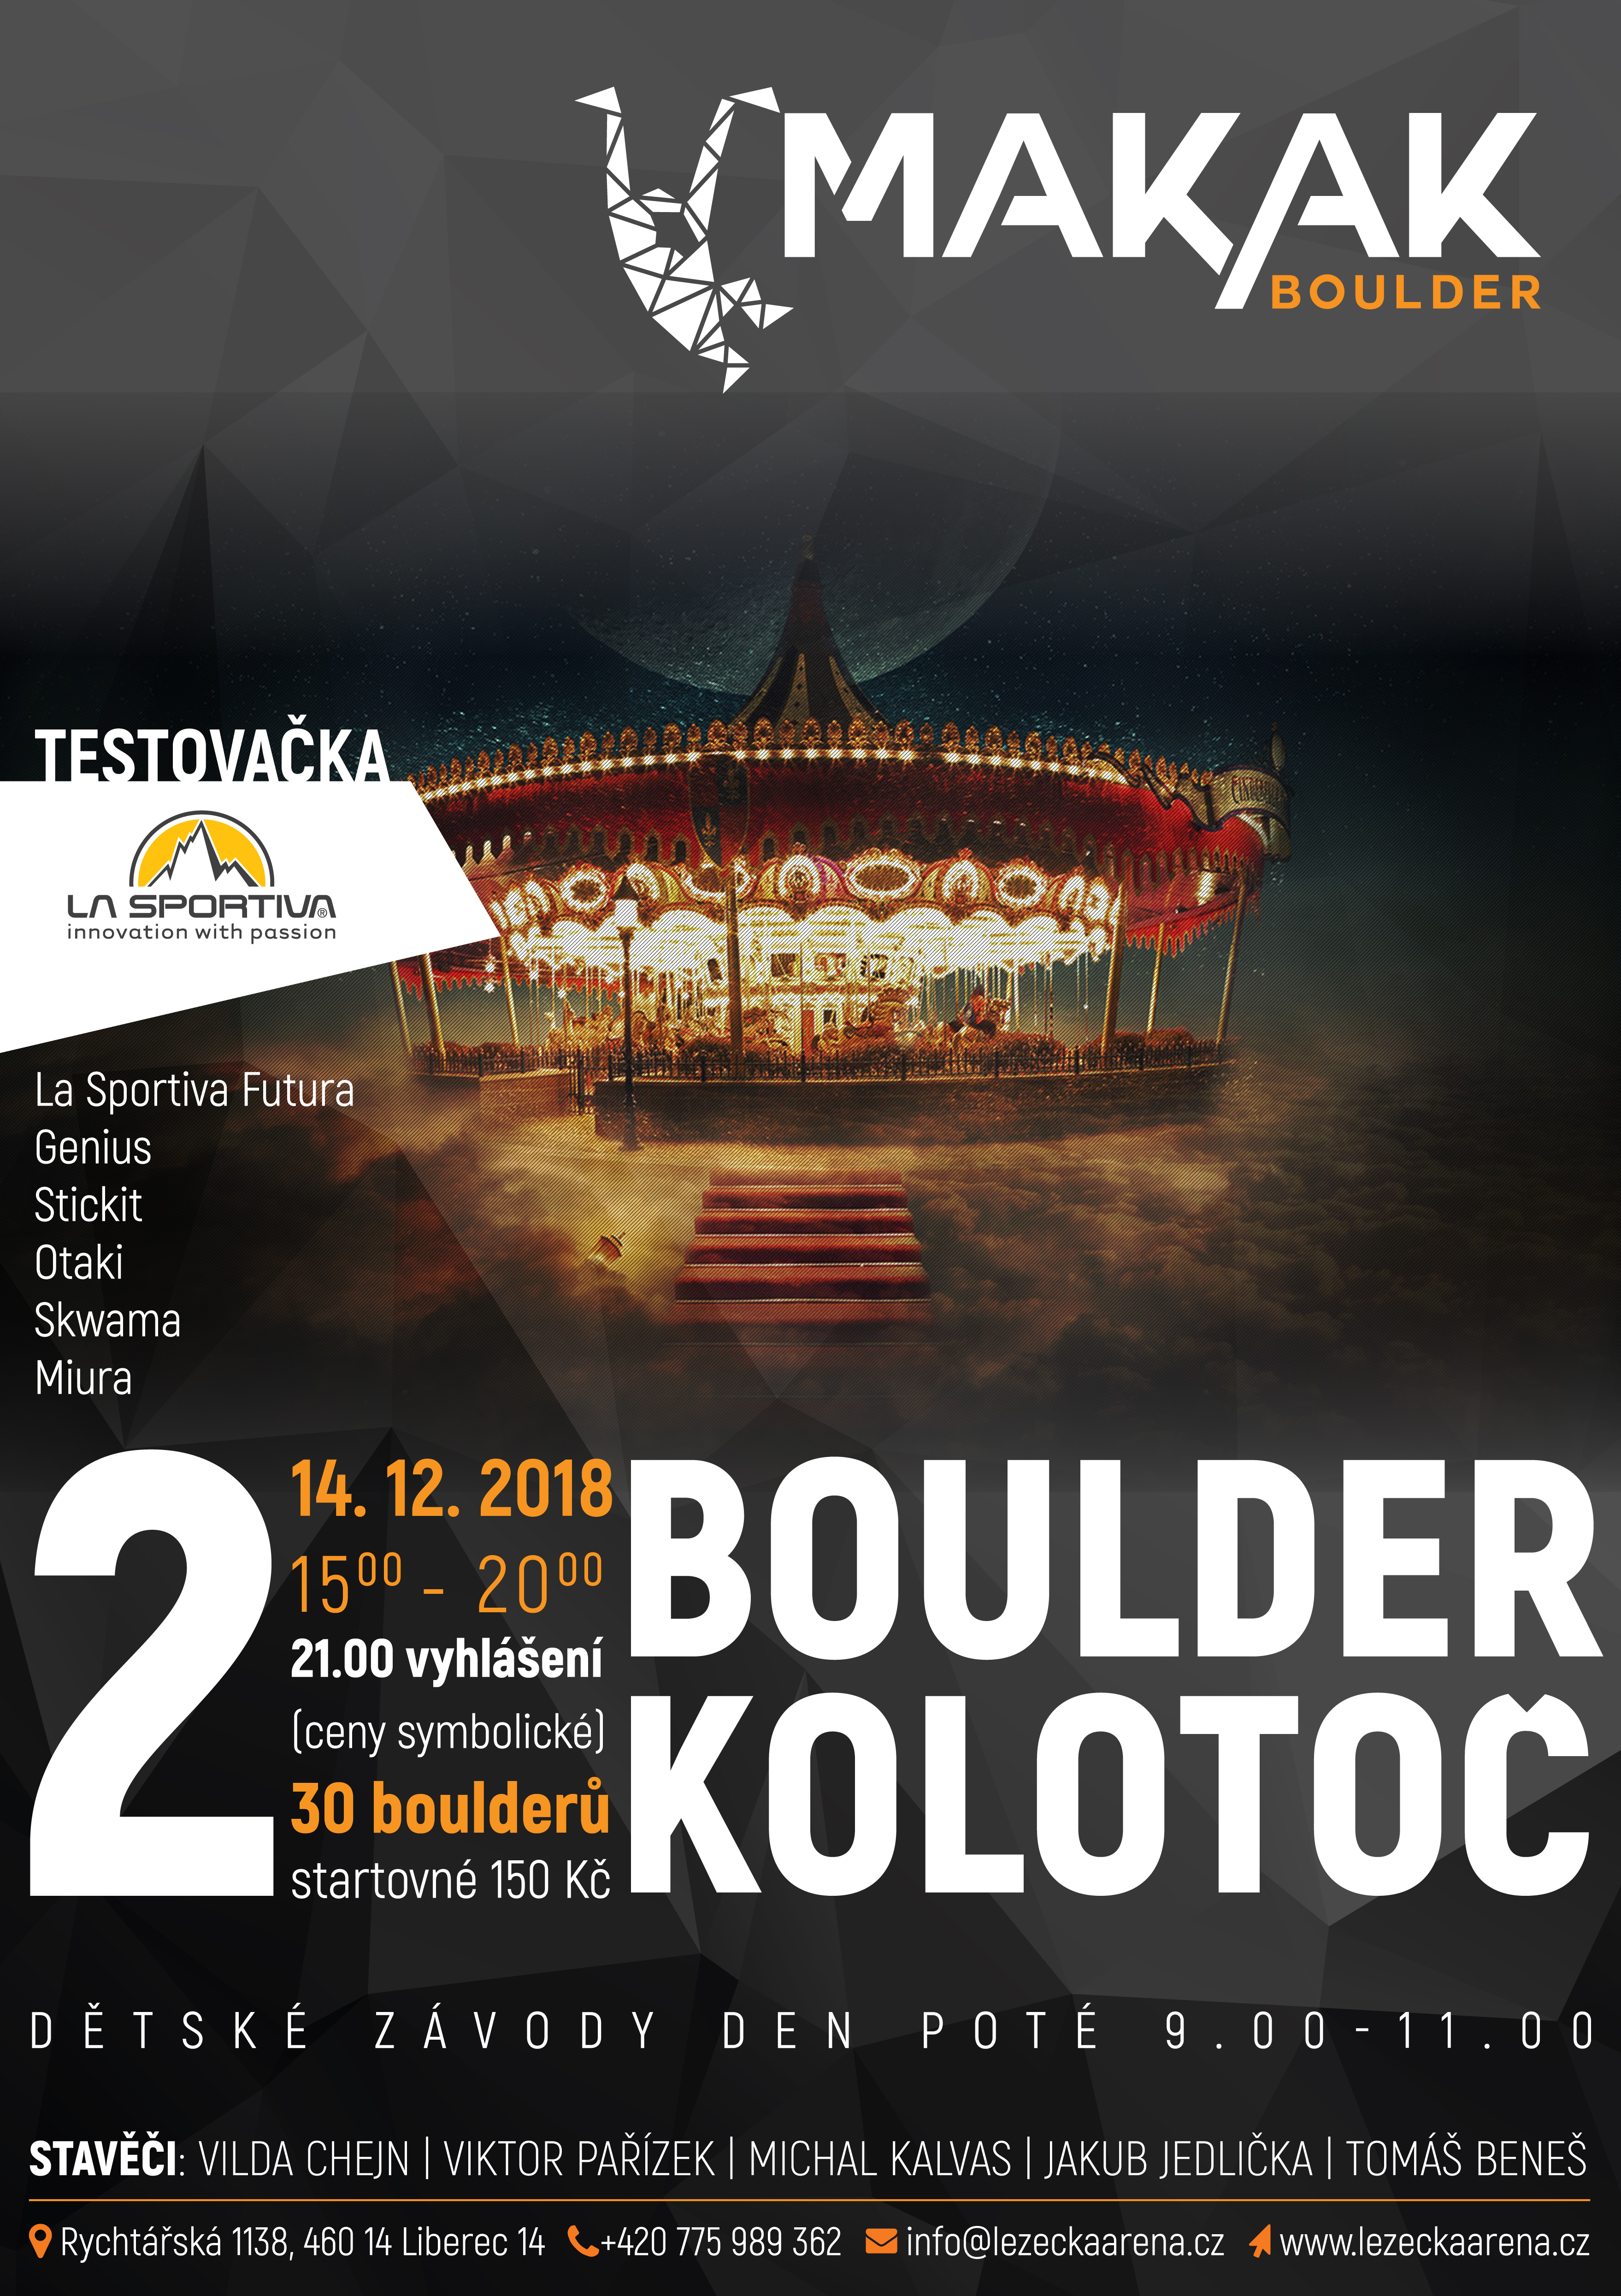 makak_boulder-kolotoc18_poster2.jpg (8.29 MB)